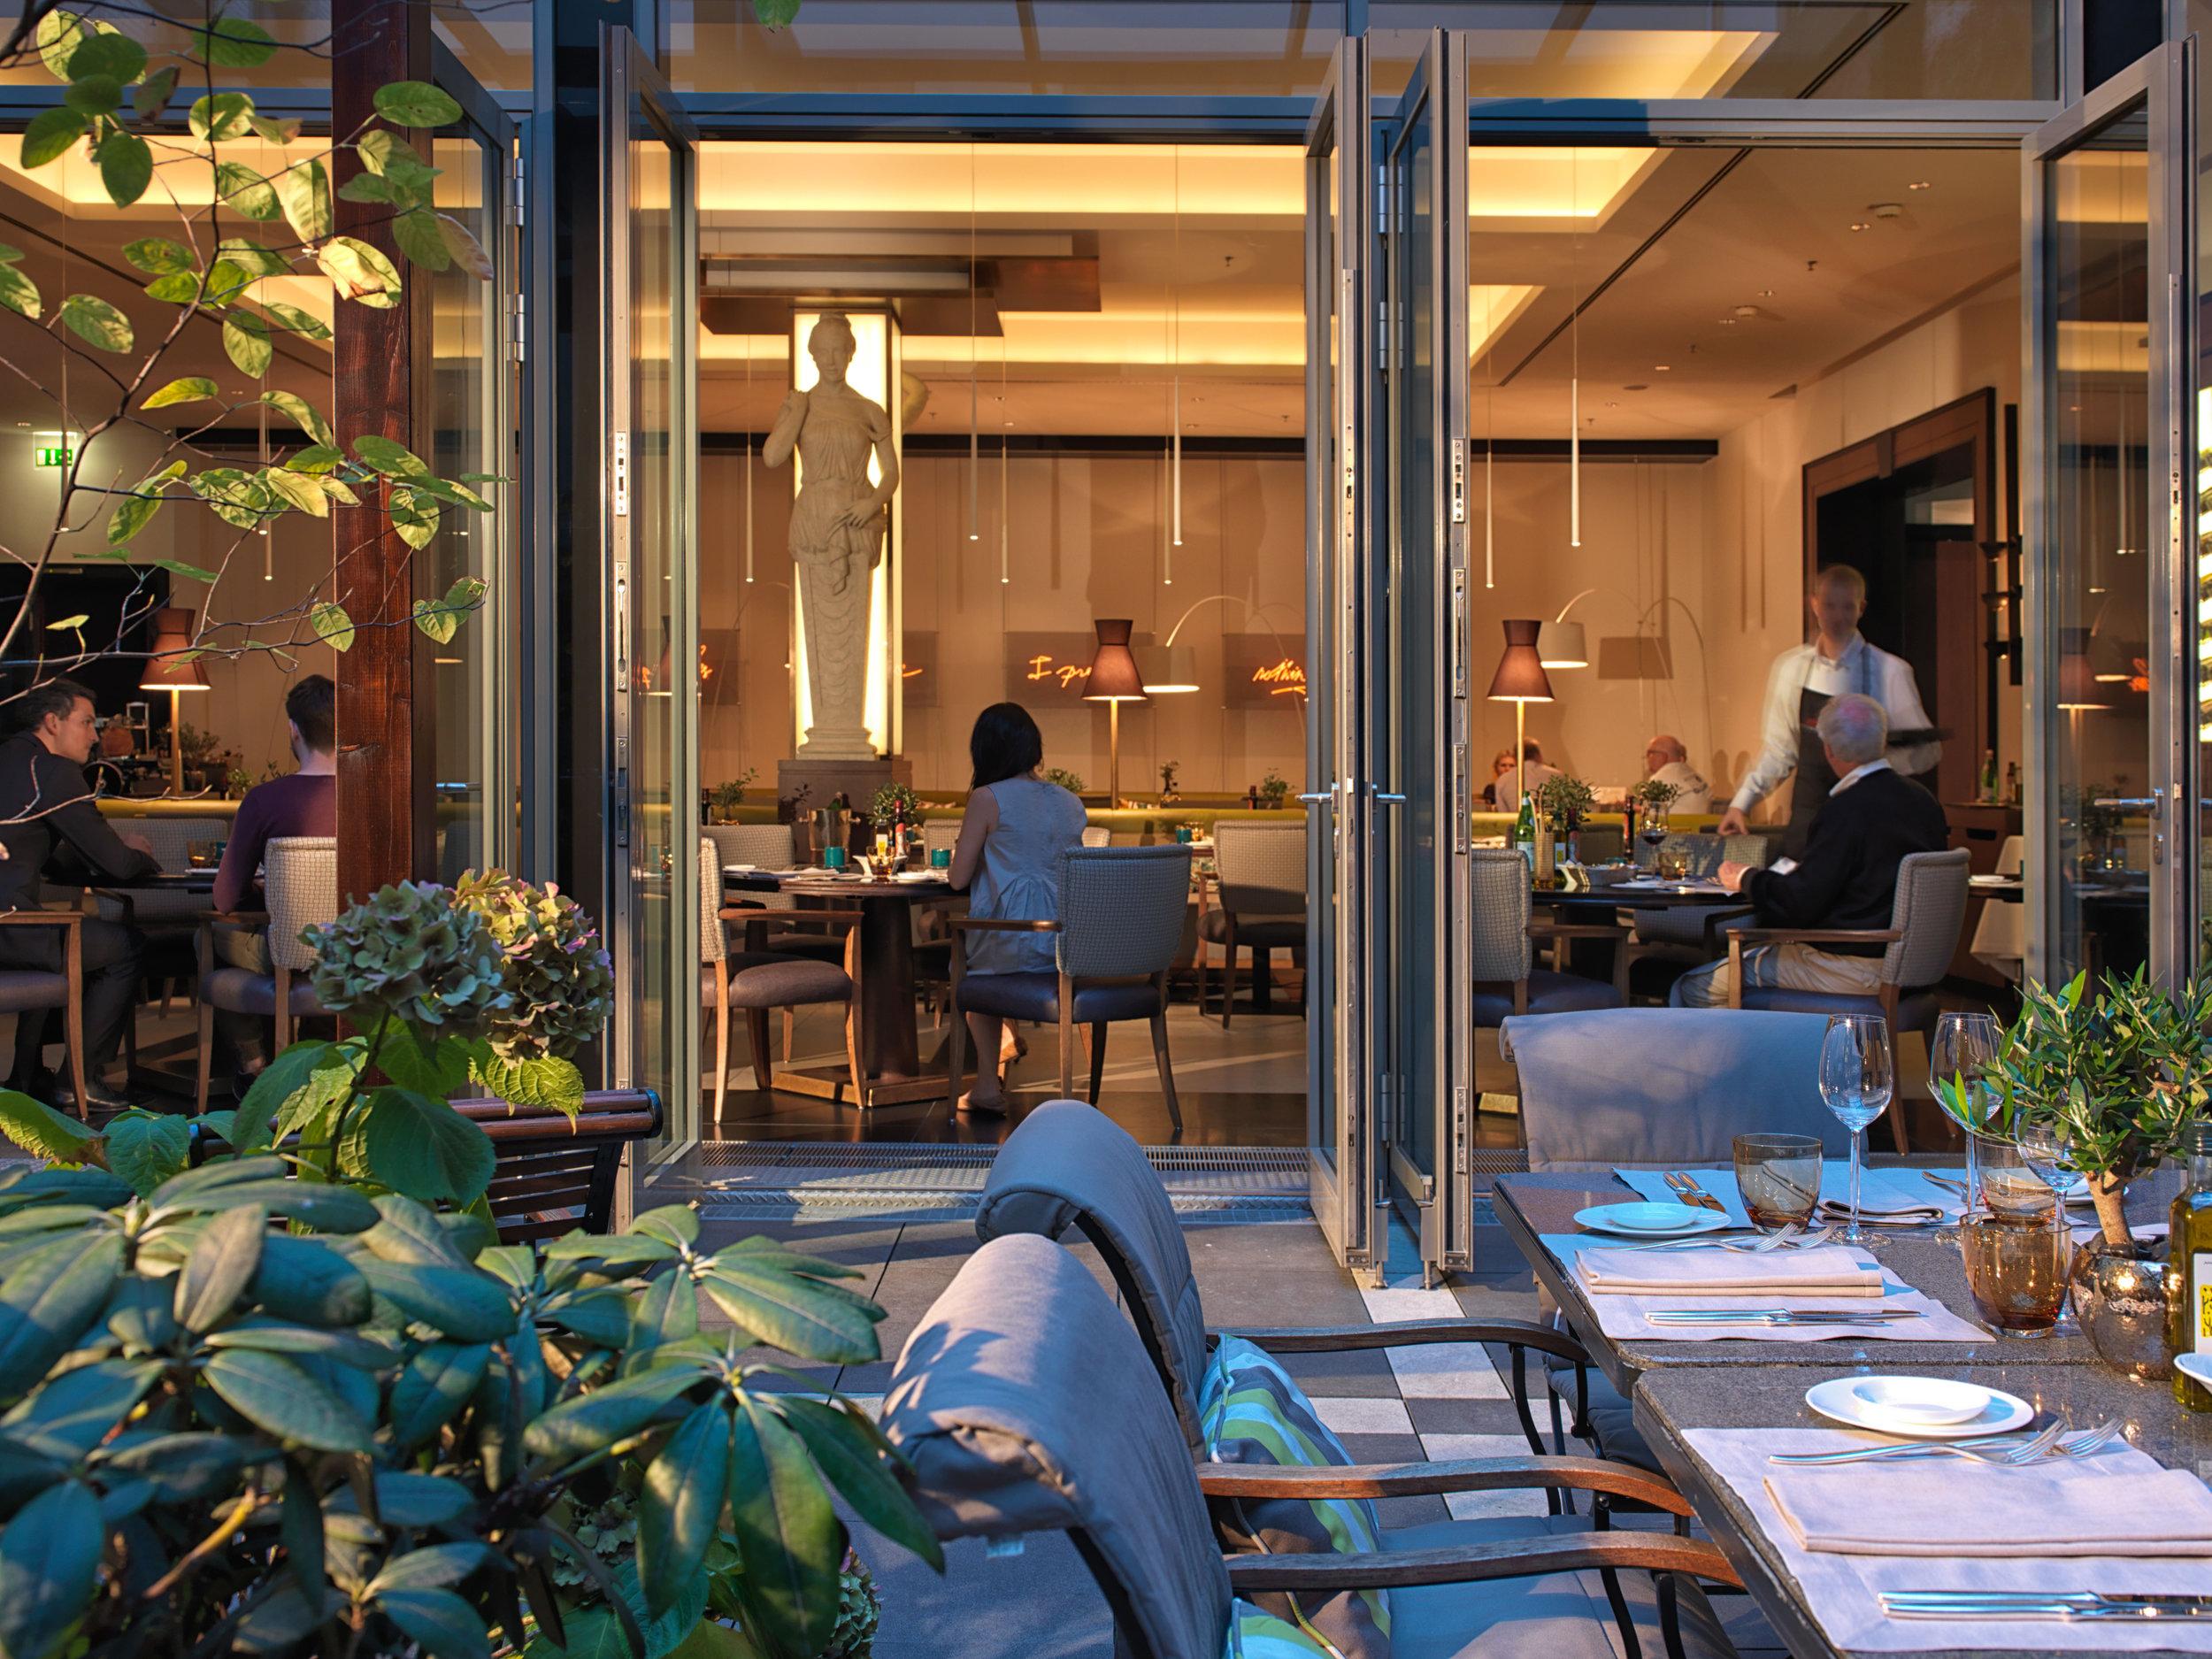 19 RFH Hotel de Rome - La Banca 1141 AH Oct 14.jpg